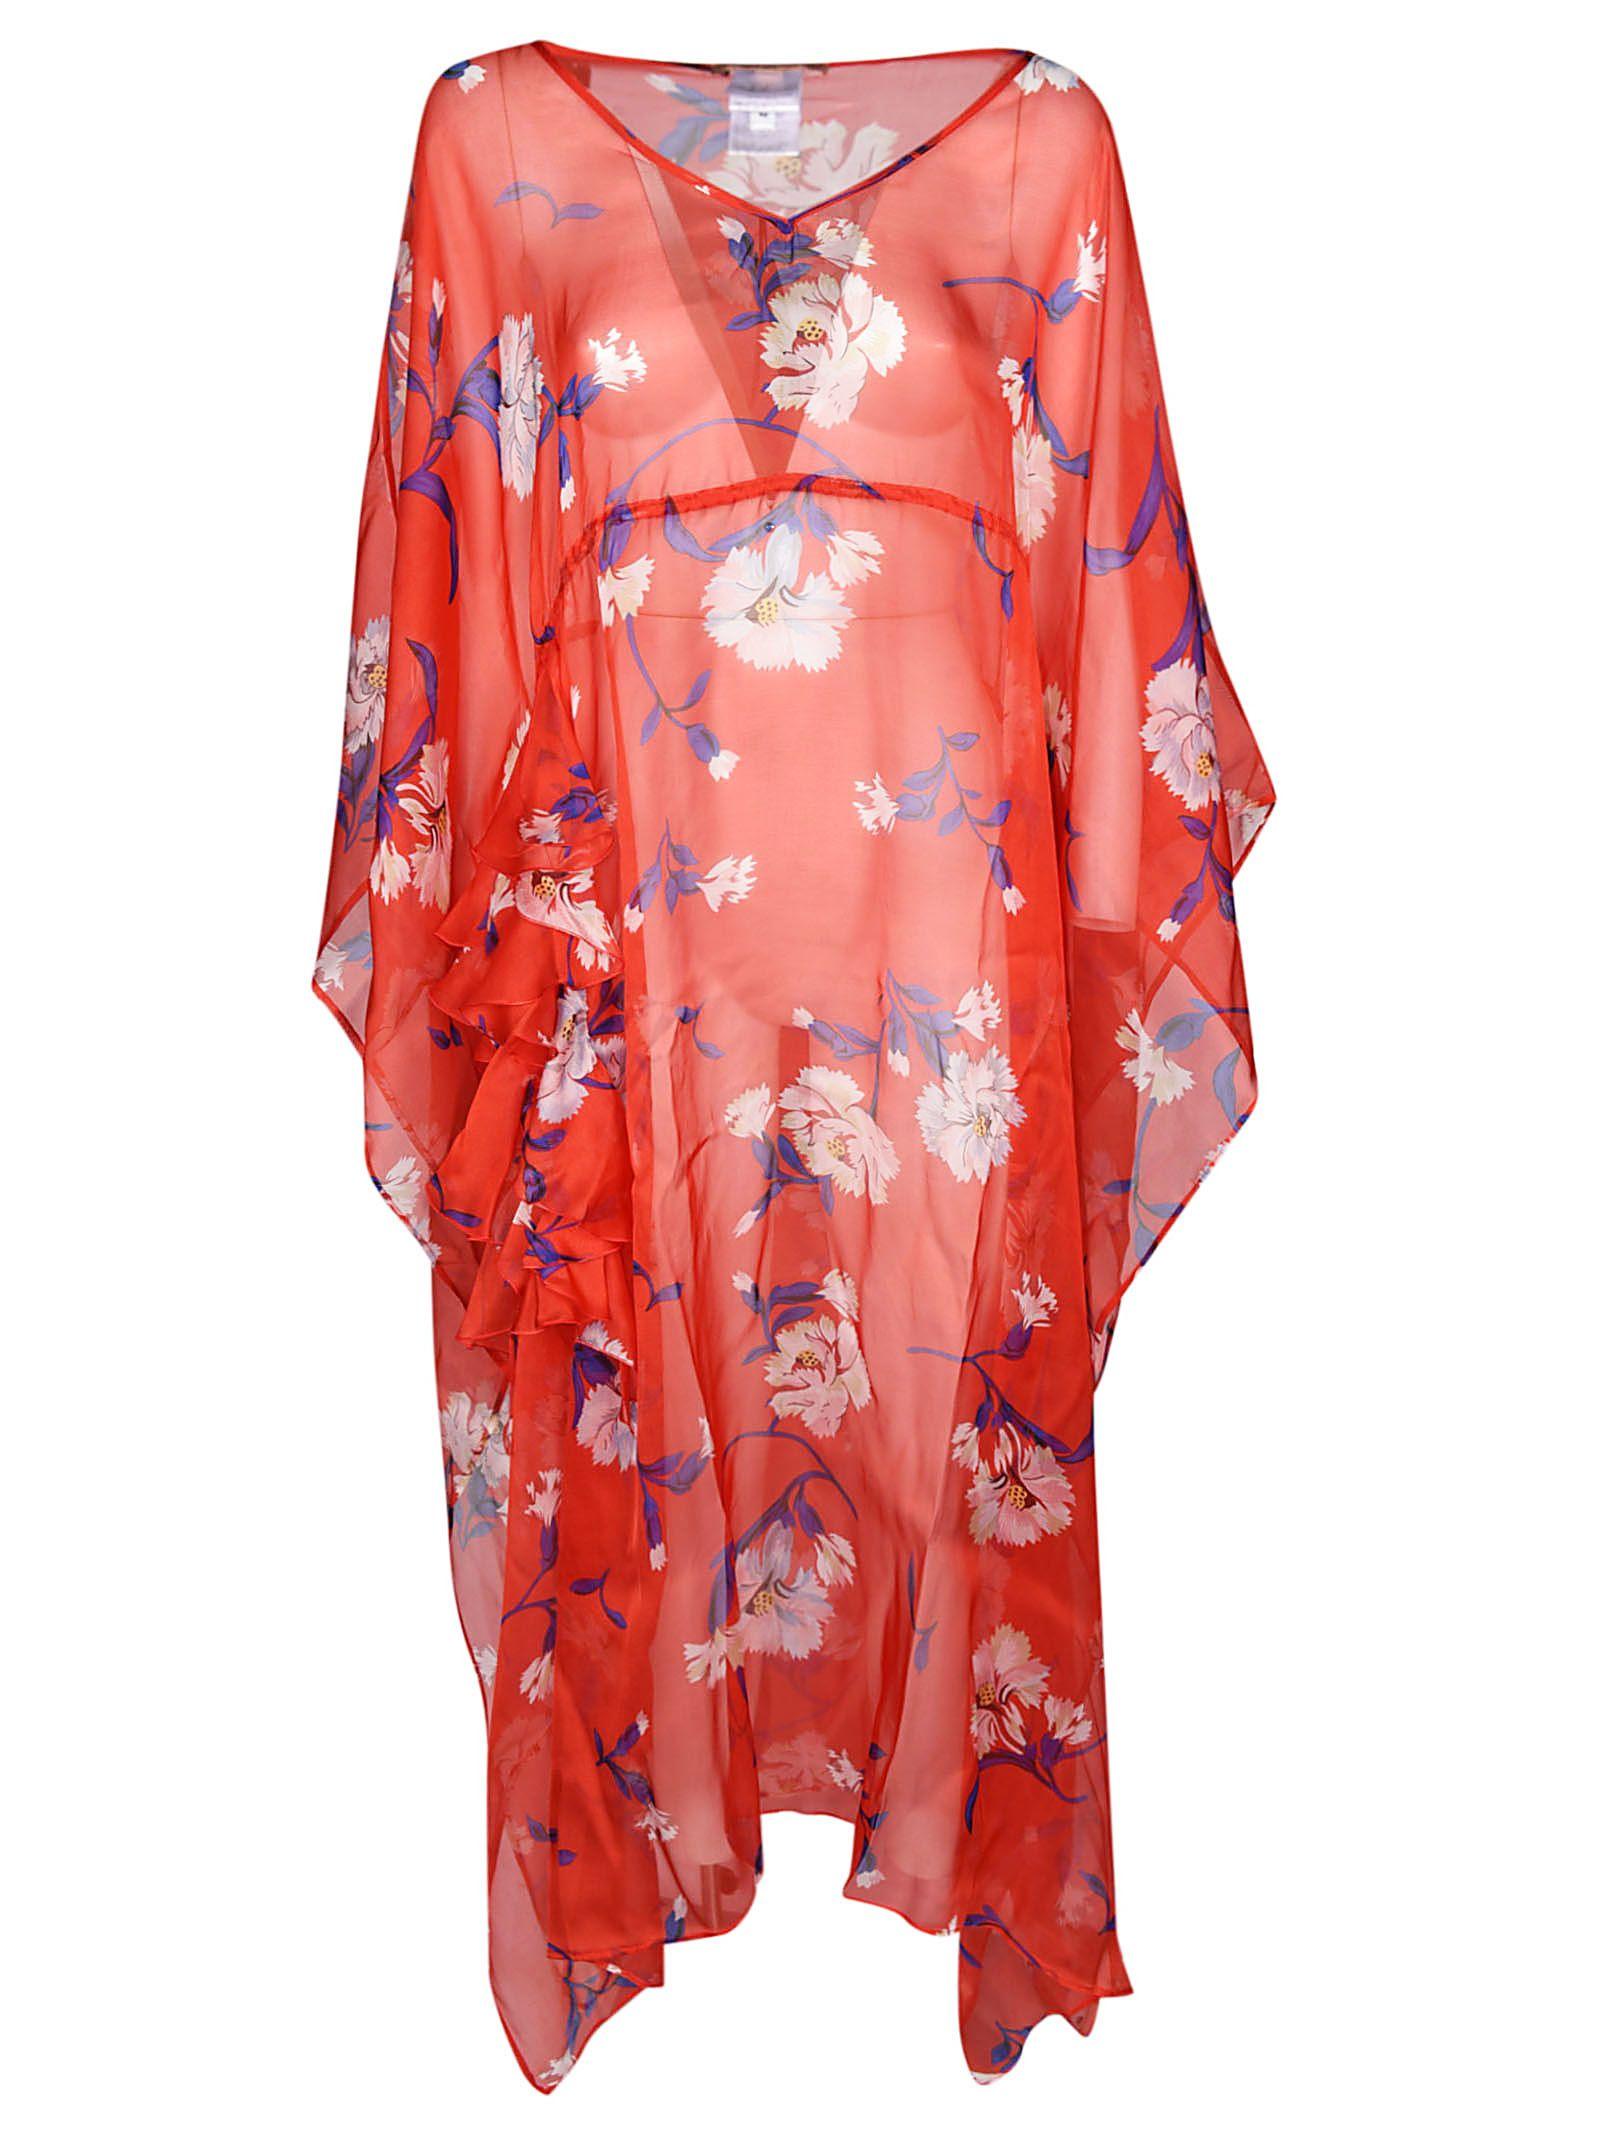 89bd1d378e4bb1 Ermanno Scervino Scervino Beachwear Floral Print Dress In Red Multicolor